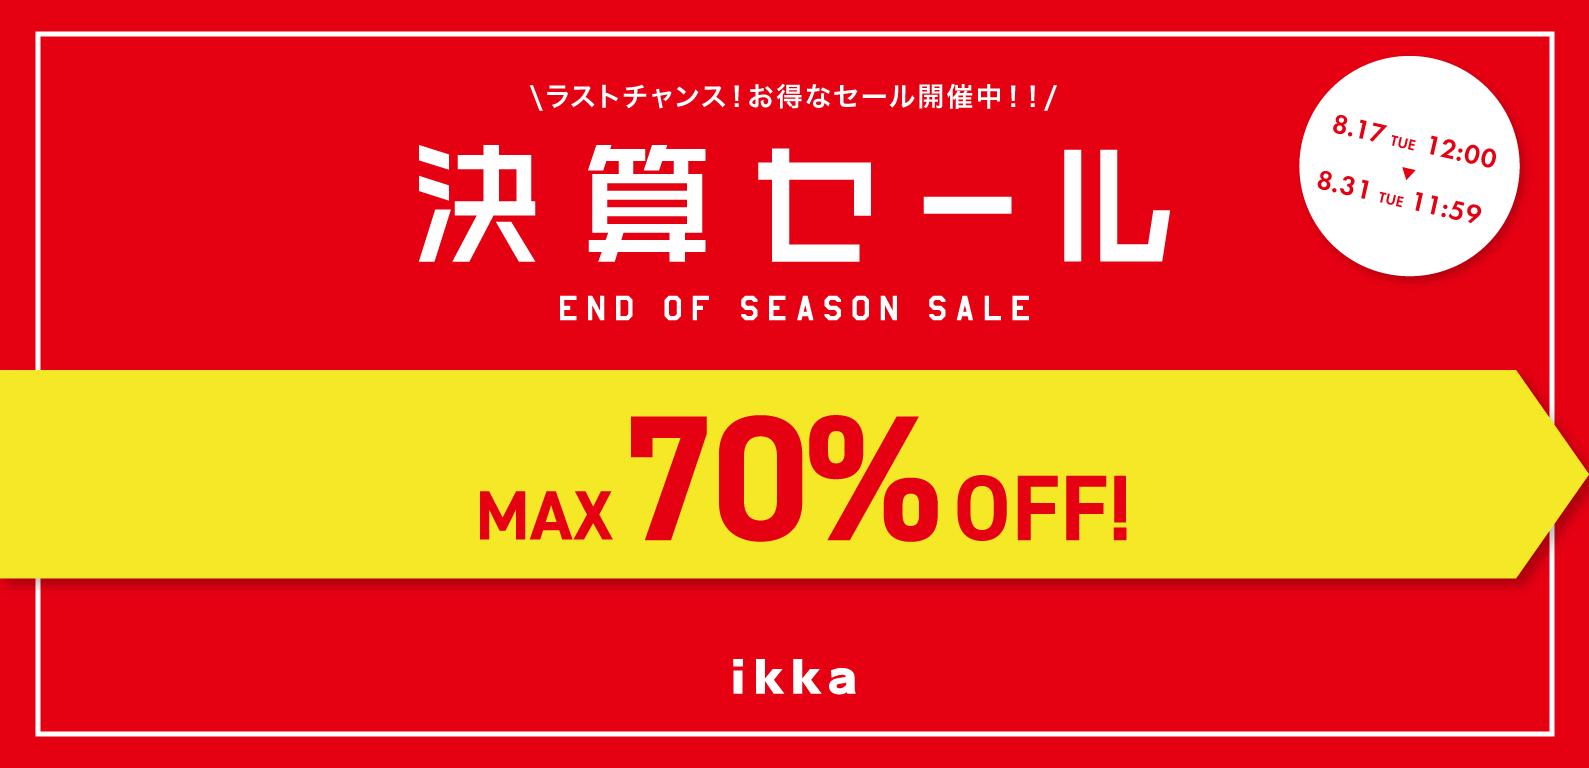 ikka | 決算SALE